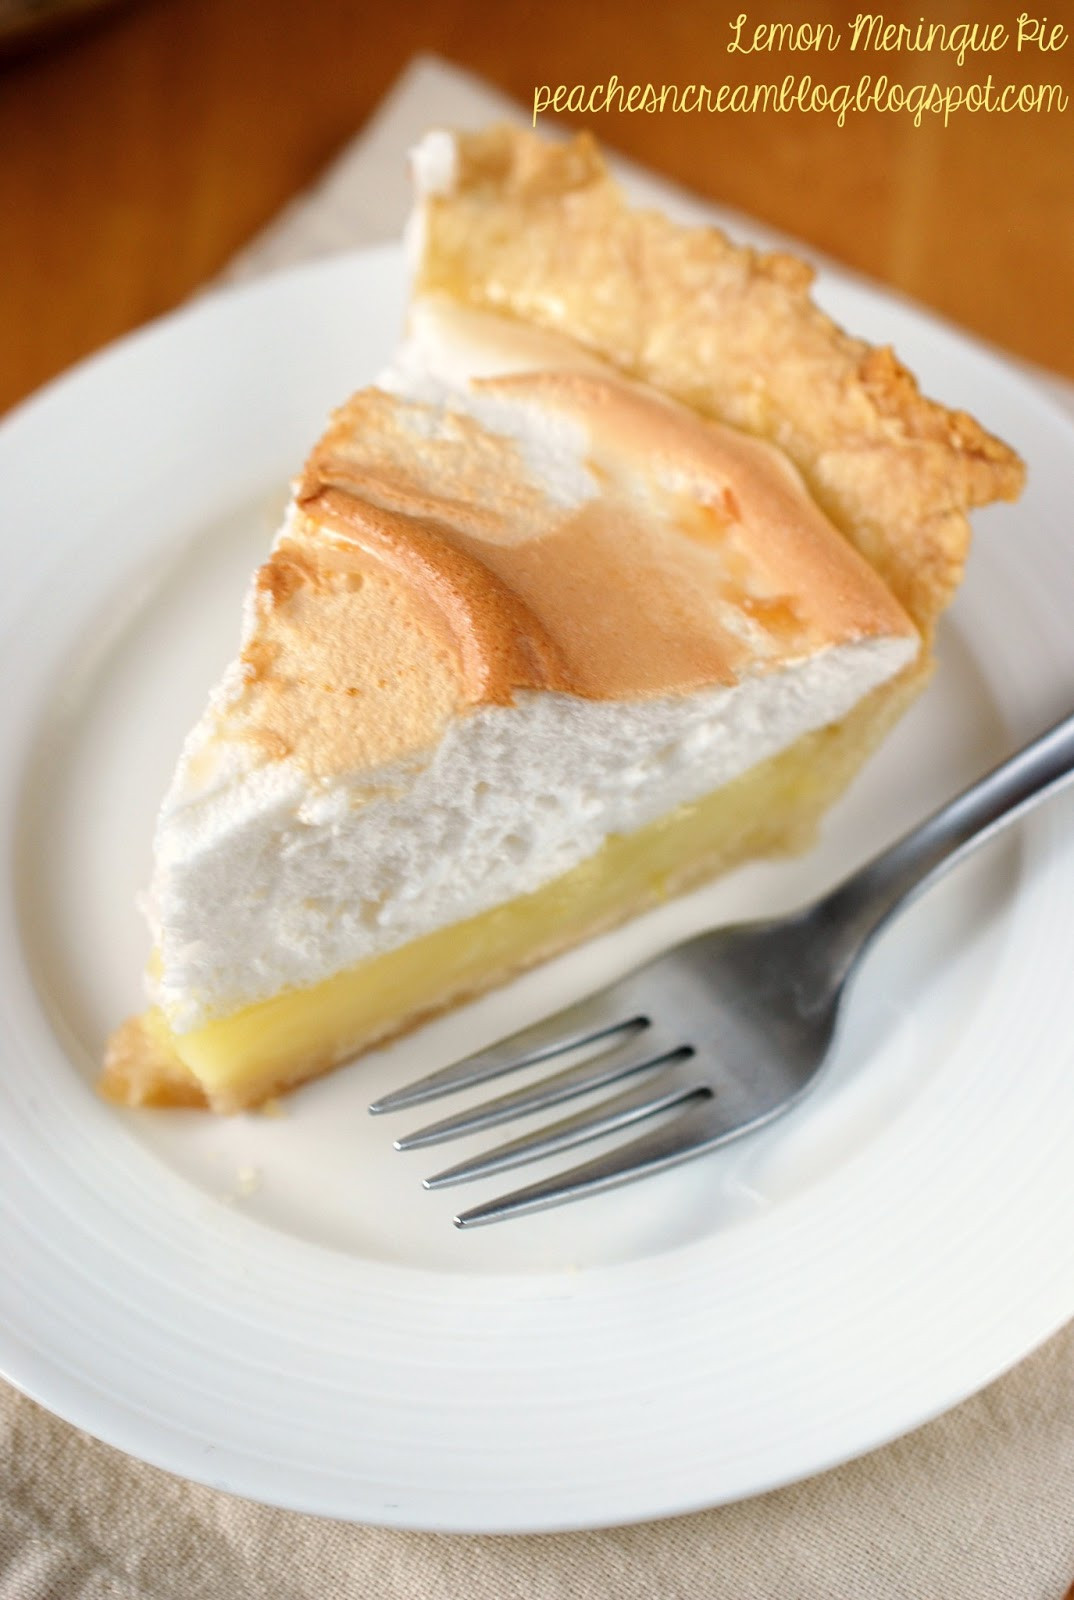 Lemon Meringue Pie Pioneer Woman  Peaches & Cream Friday Jan 25 2013